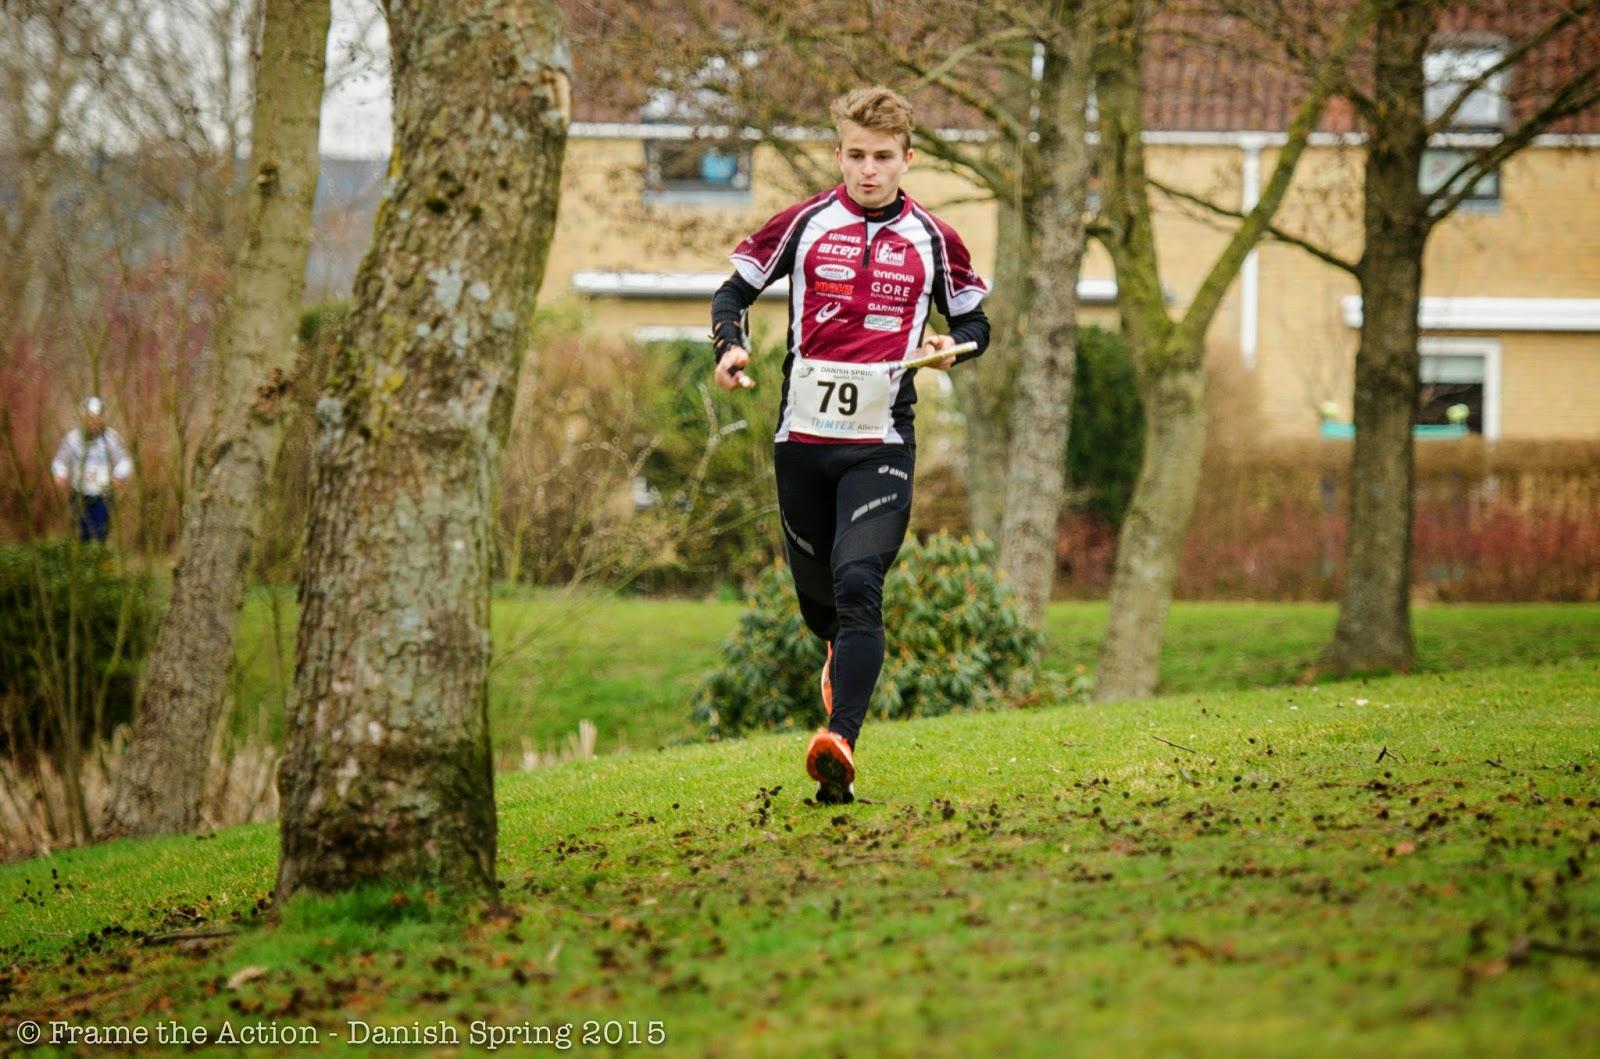 Portuguese Orienteering Blog: Danish Spring 2017: Maja Alm